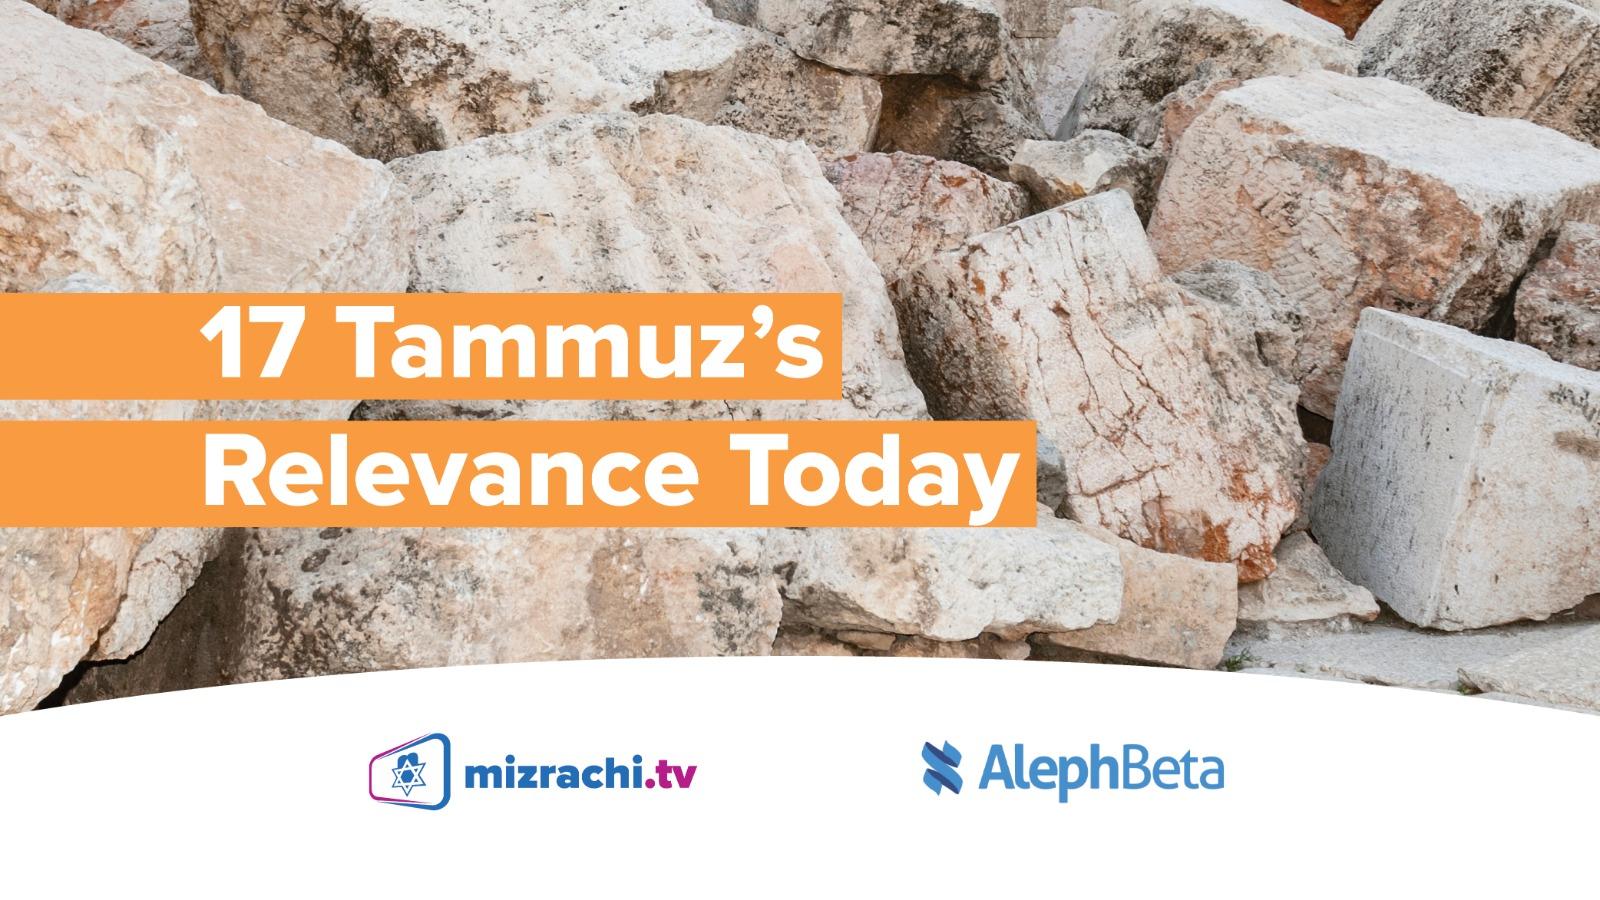 How Is 17 Tammuz Relevant Today